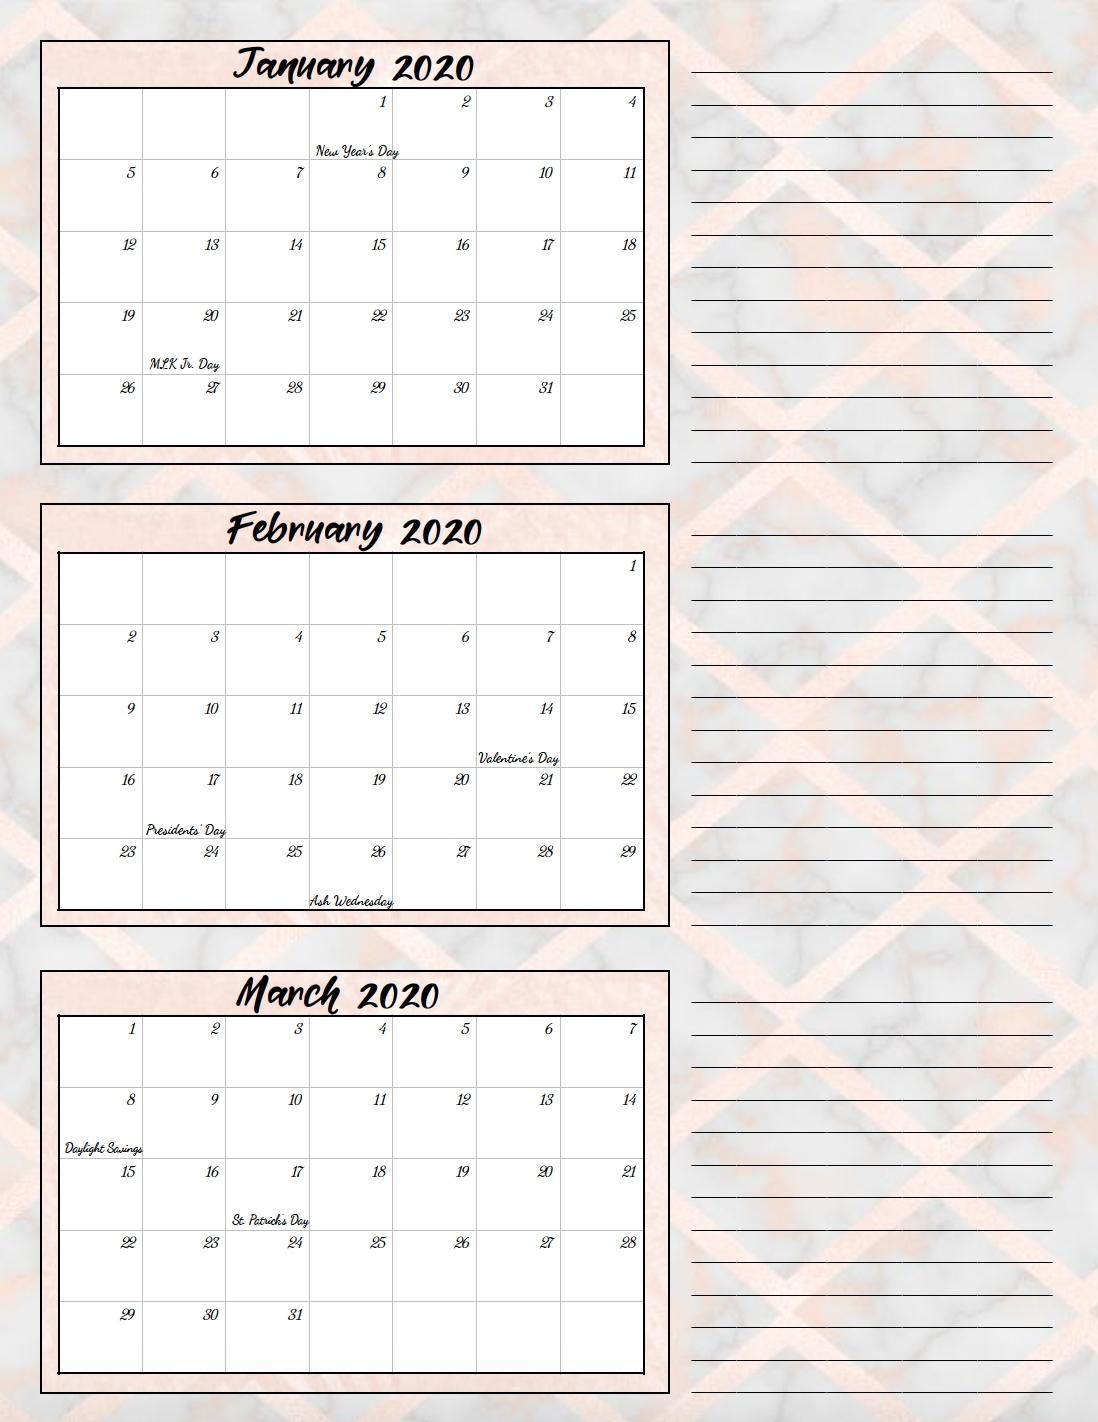 Free Printable 2020 Quarterly Calendars With Holidays: 3 within Calendar For Quarterly 2020 Printable